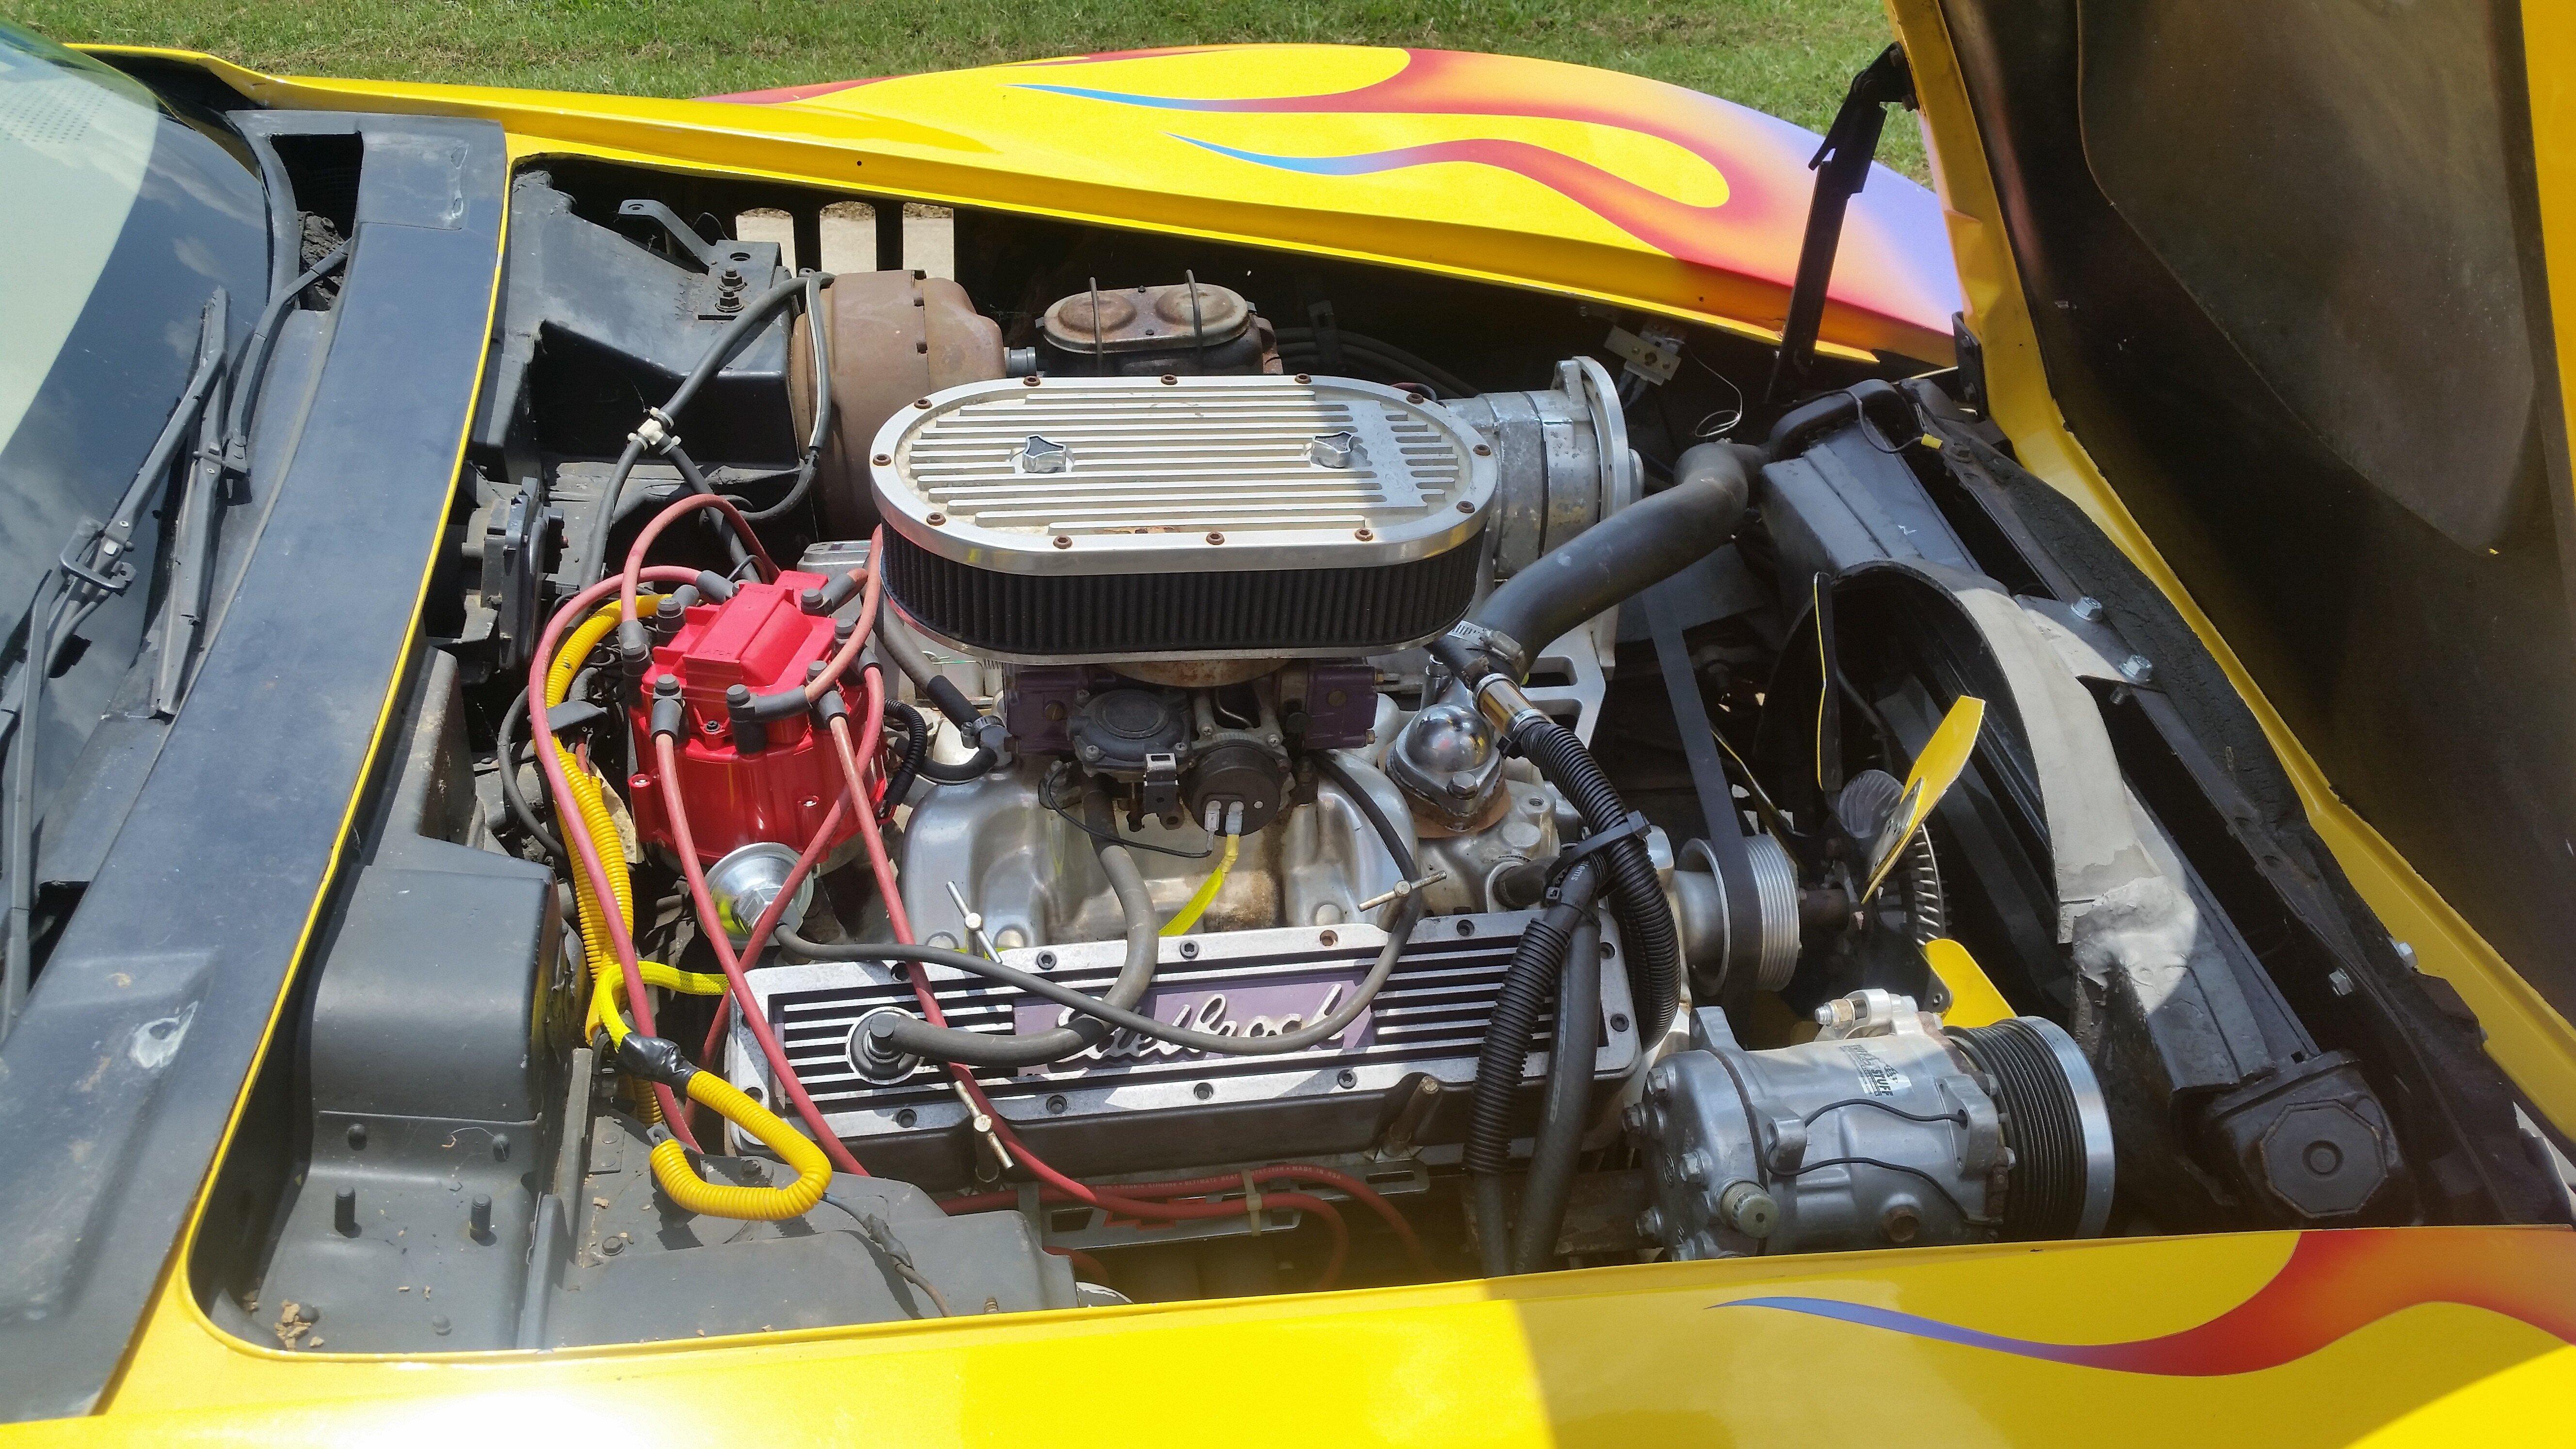 1976 Chevrolet Corvette Classics For Sale On Autotrader 1999 Dodge Dakota Fuel Filter Location